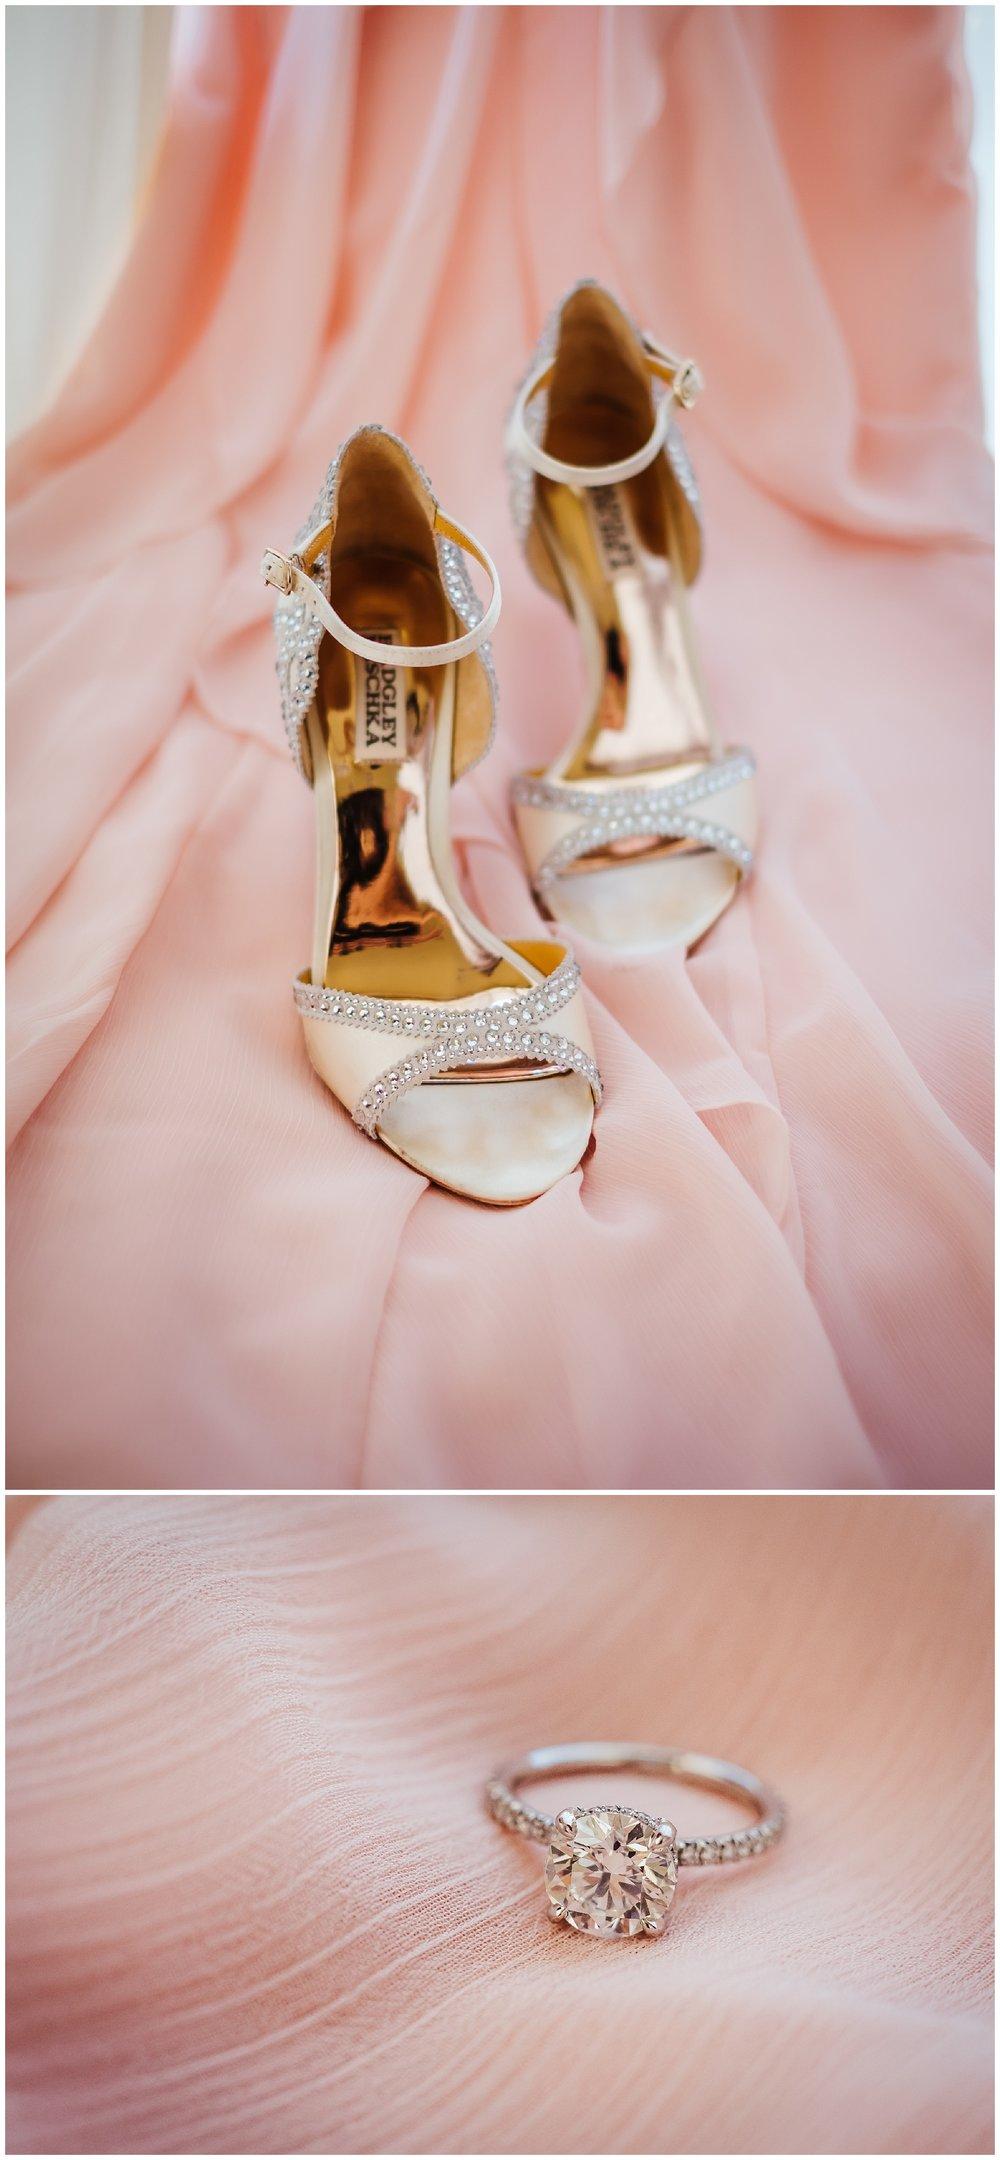 tampa-bradenton-wedding-photographer-south-florida-museum-classic-blush-gold-alpacas-sparklers_0003.jpg